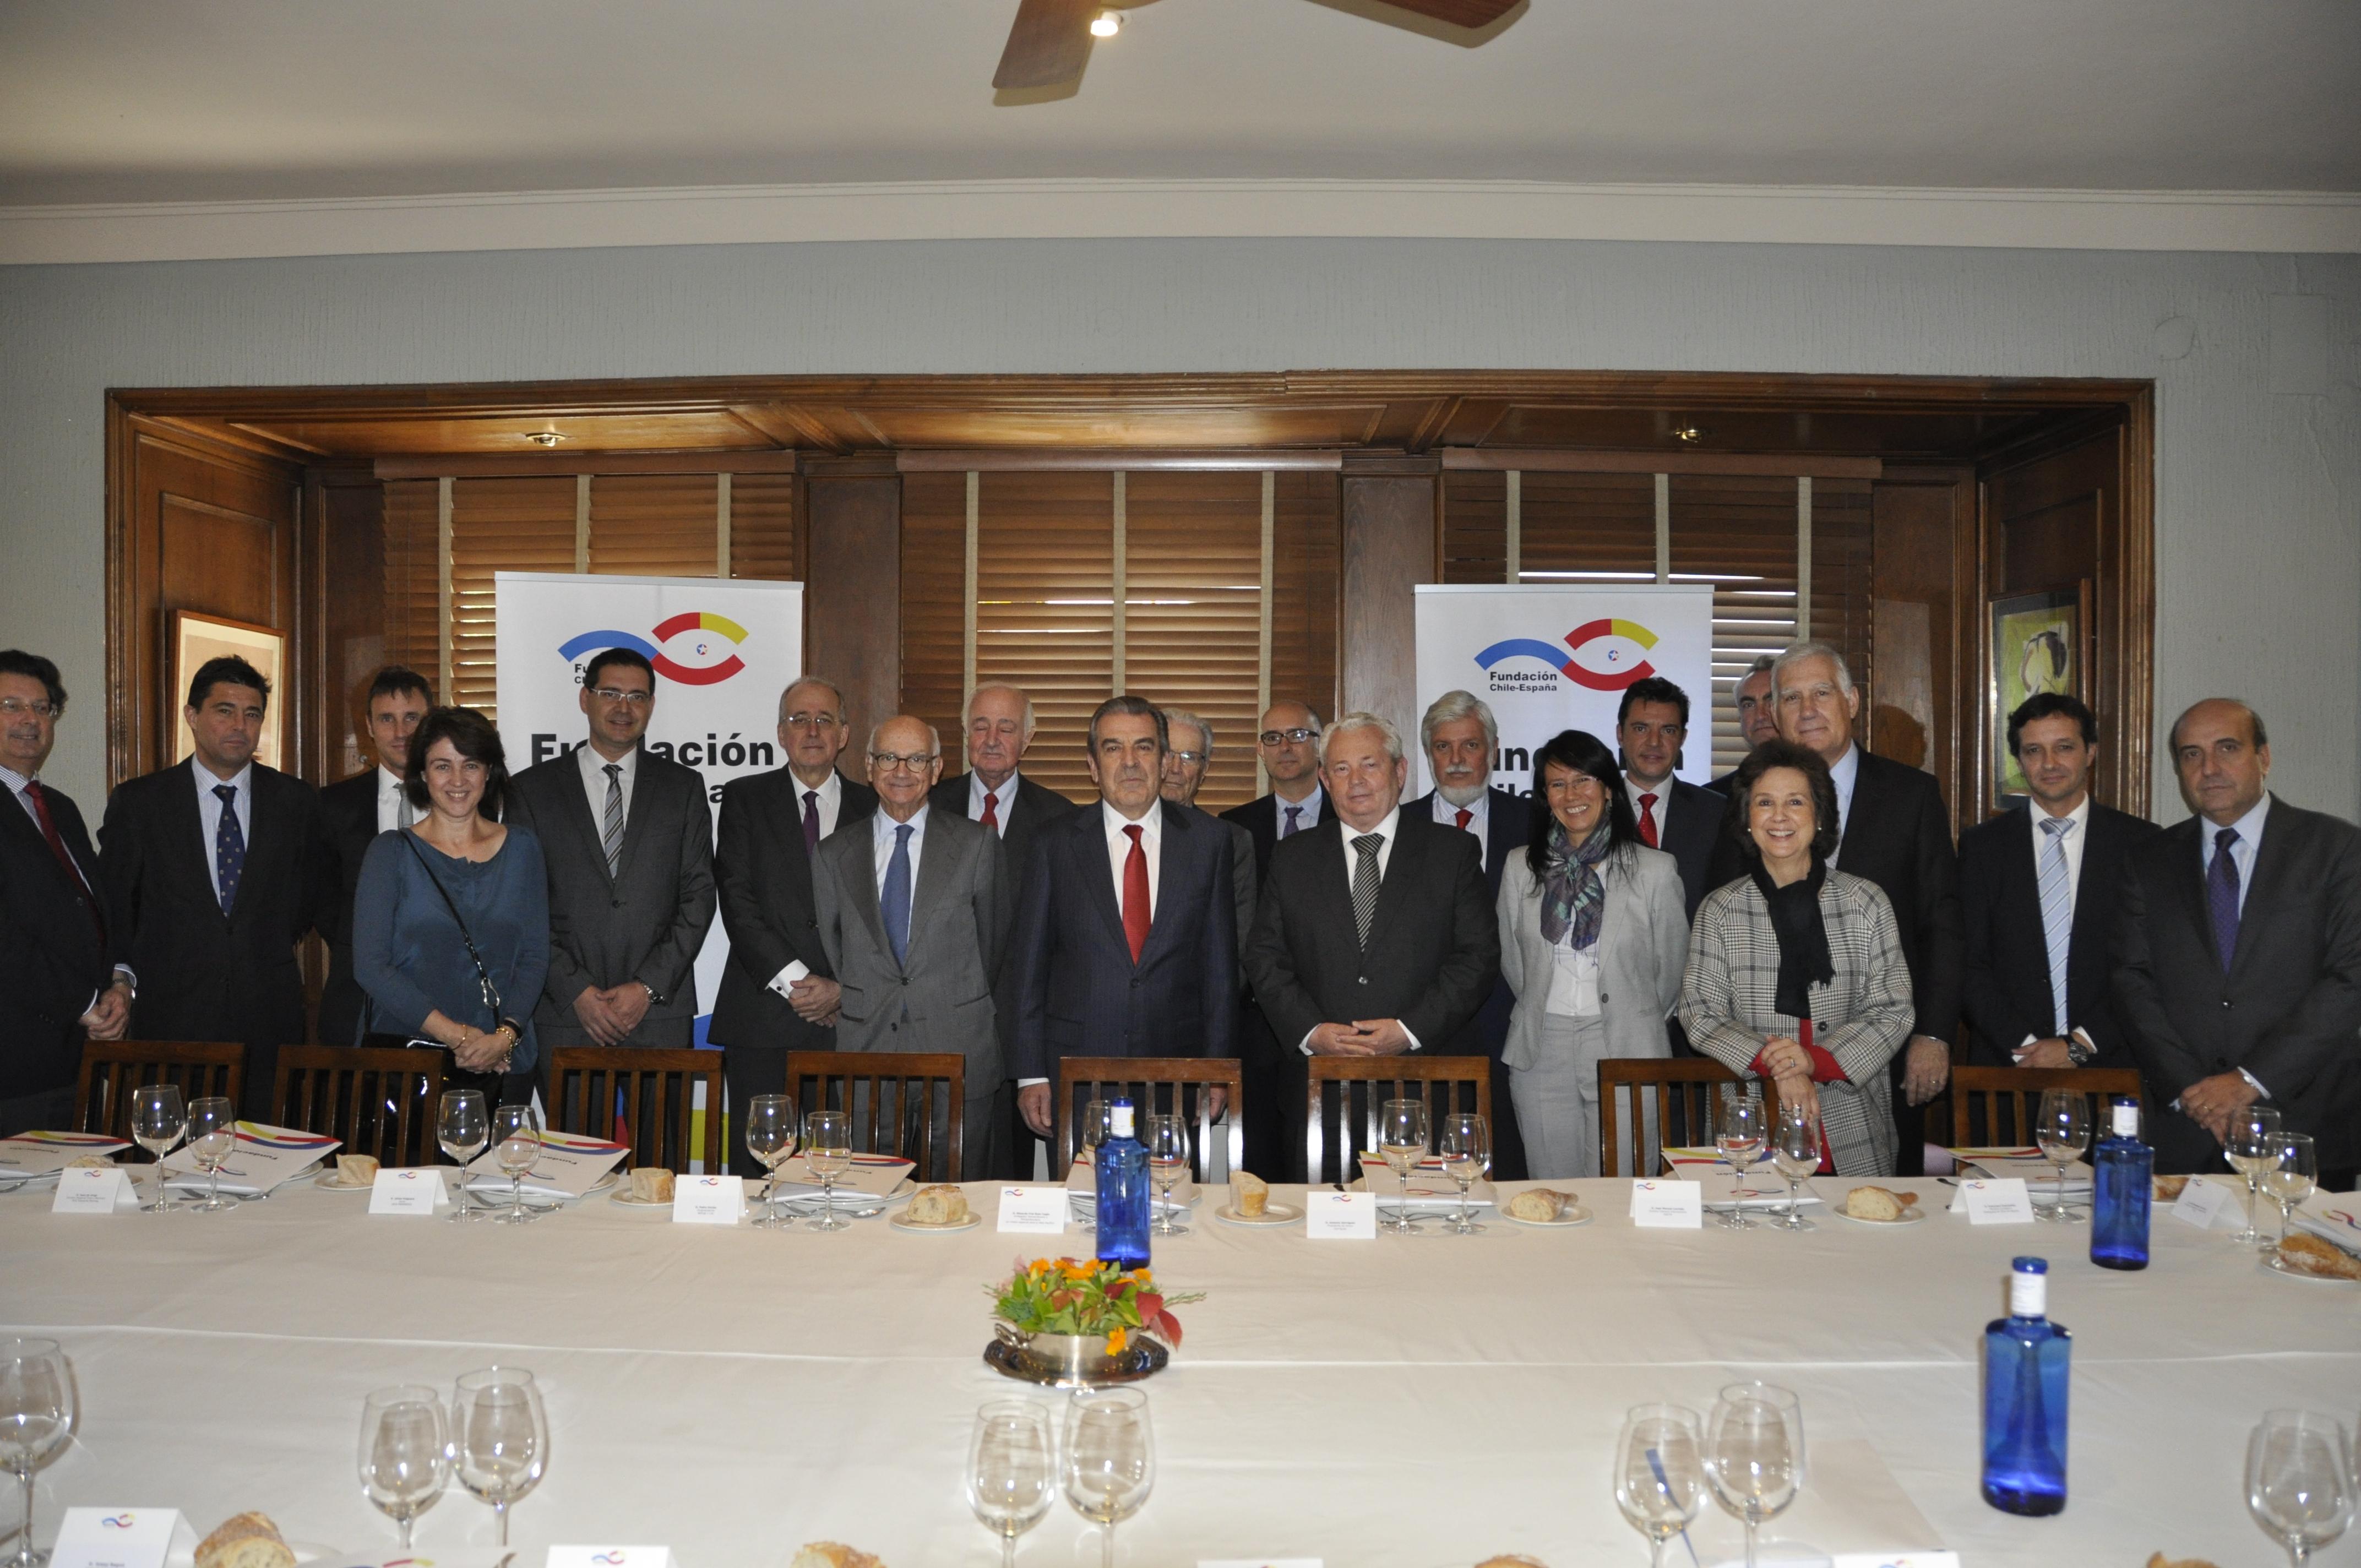 Almuerzo Coloquio con el presidente de Chile, Eduardo Frei Ruiz-Tagle